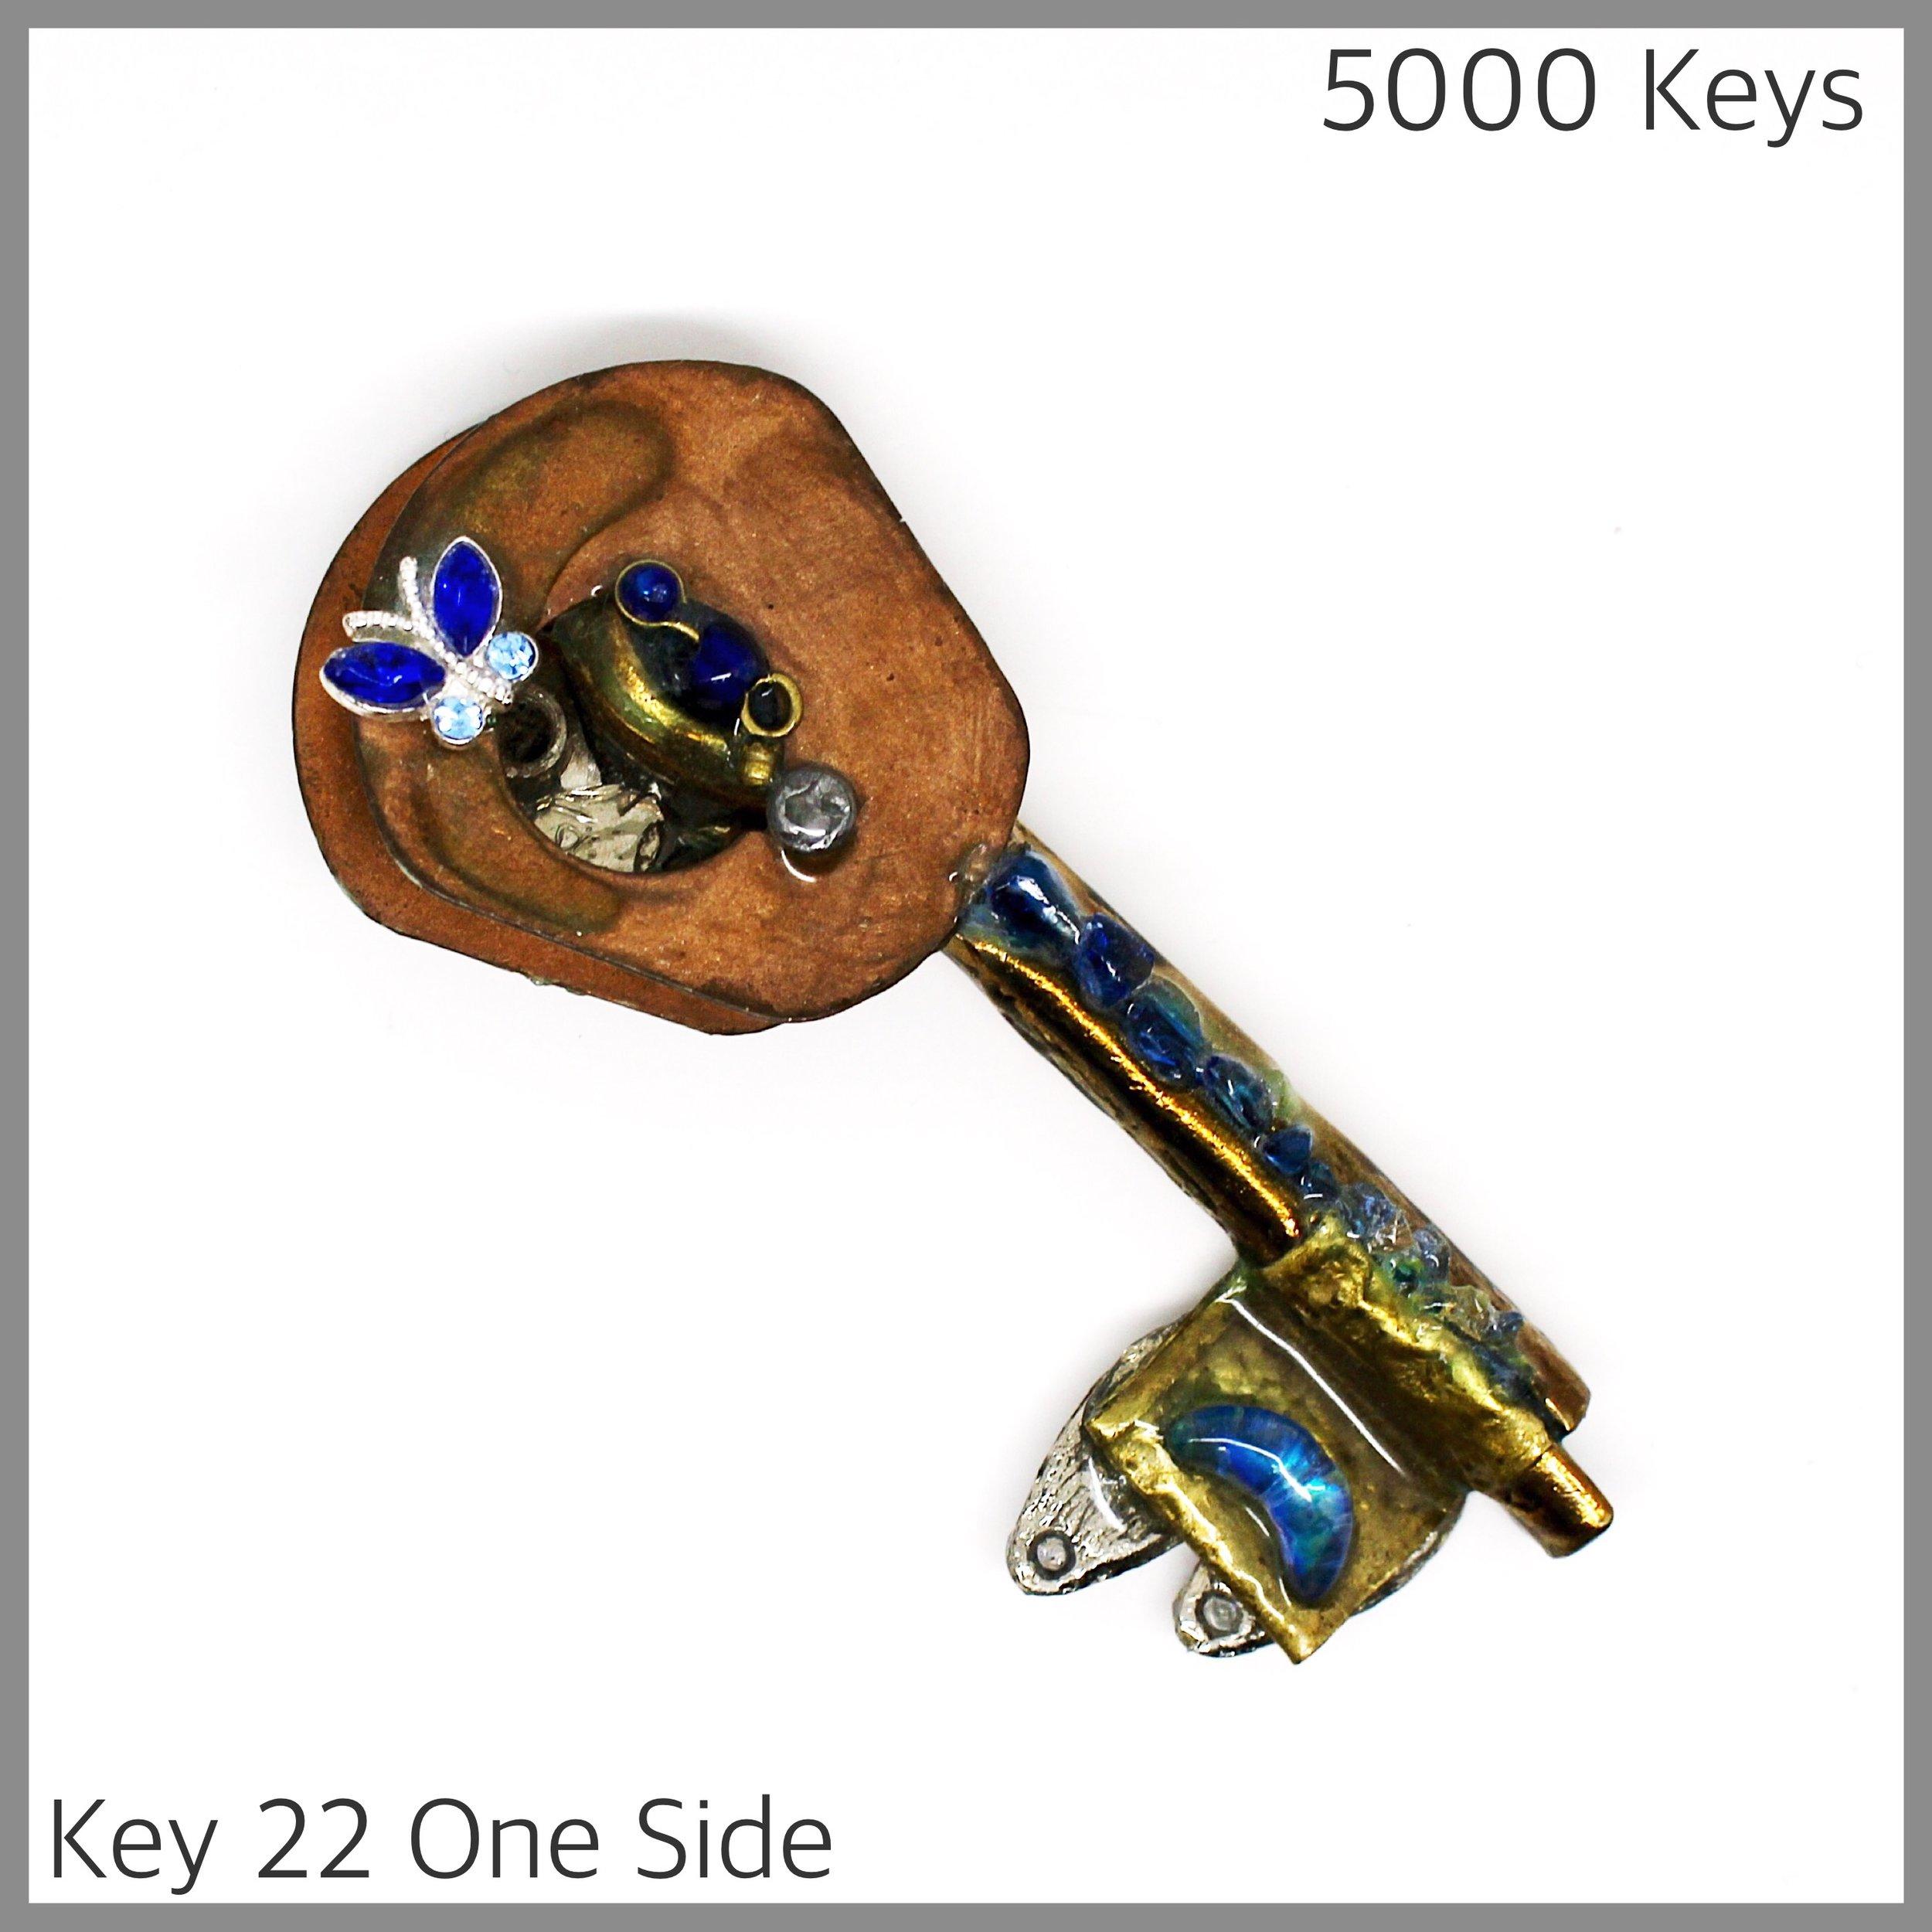 Key 22 one side - 1.JPG